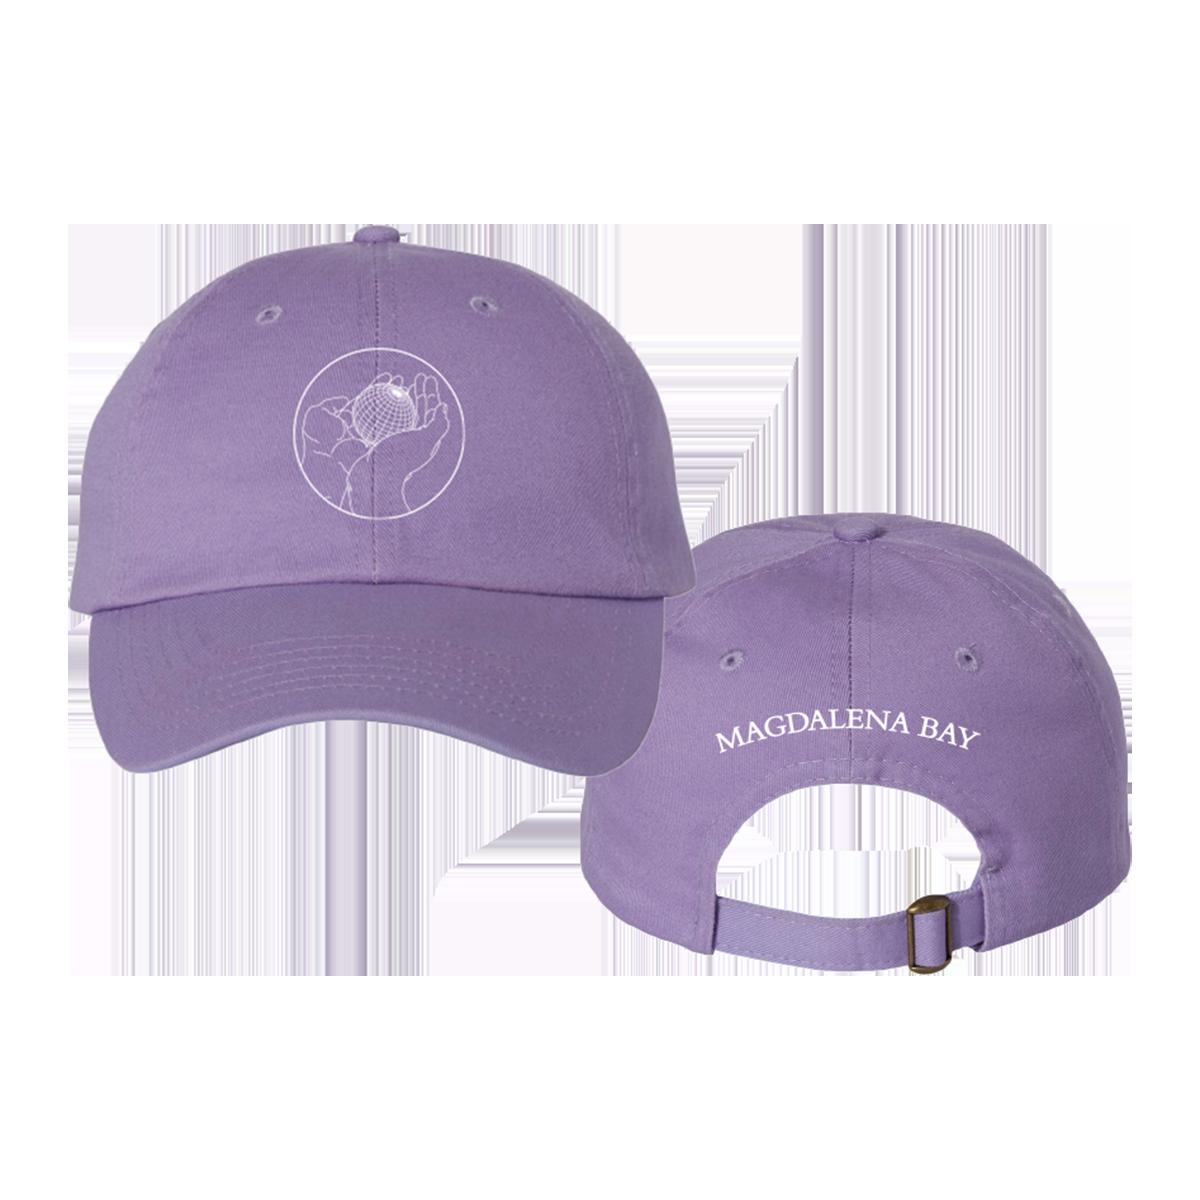 Mercurial World Hat